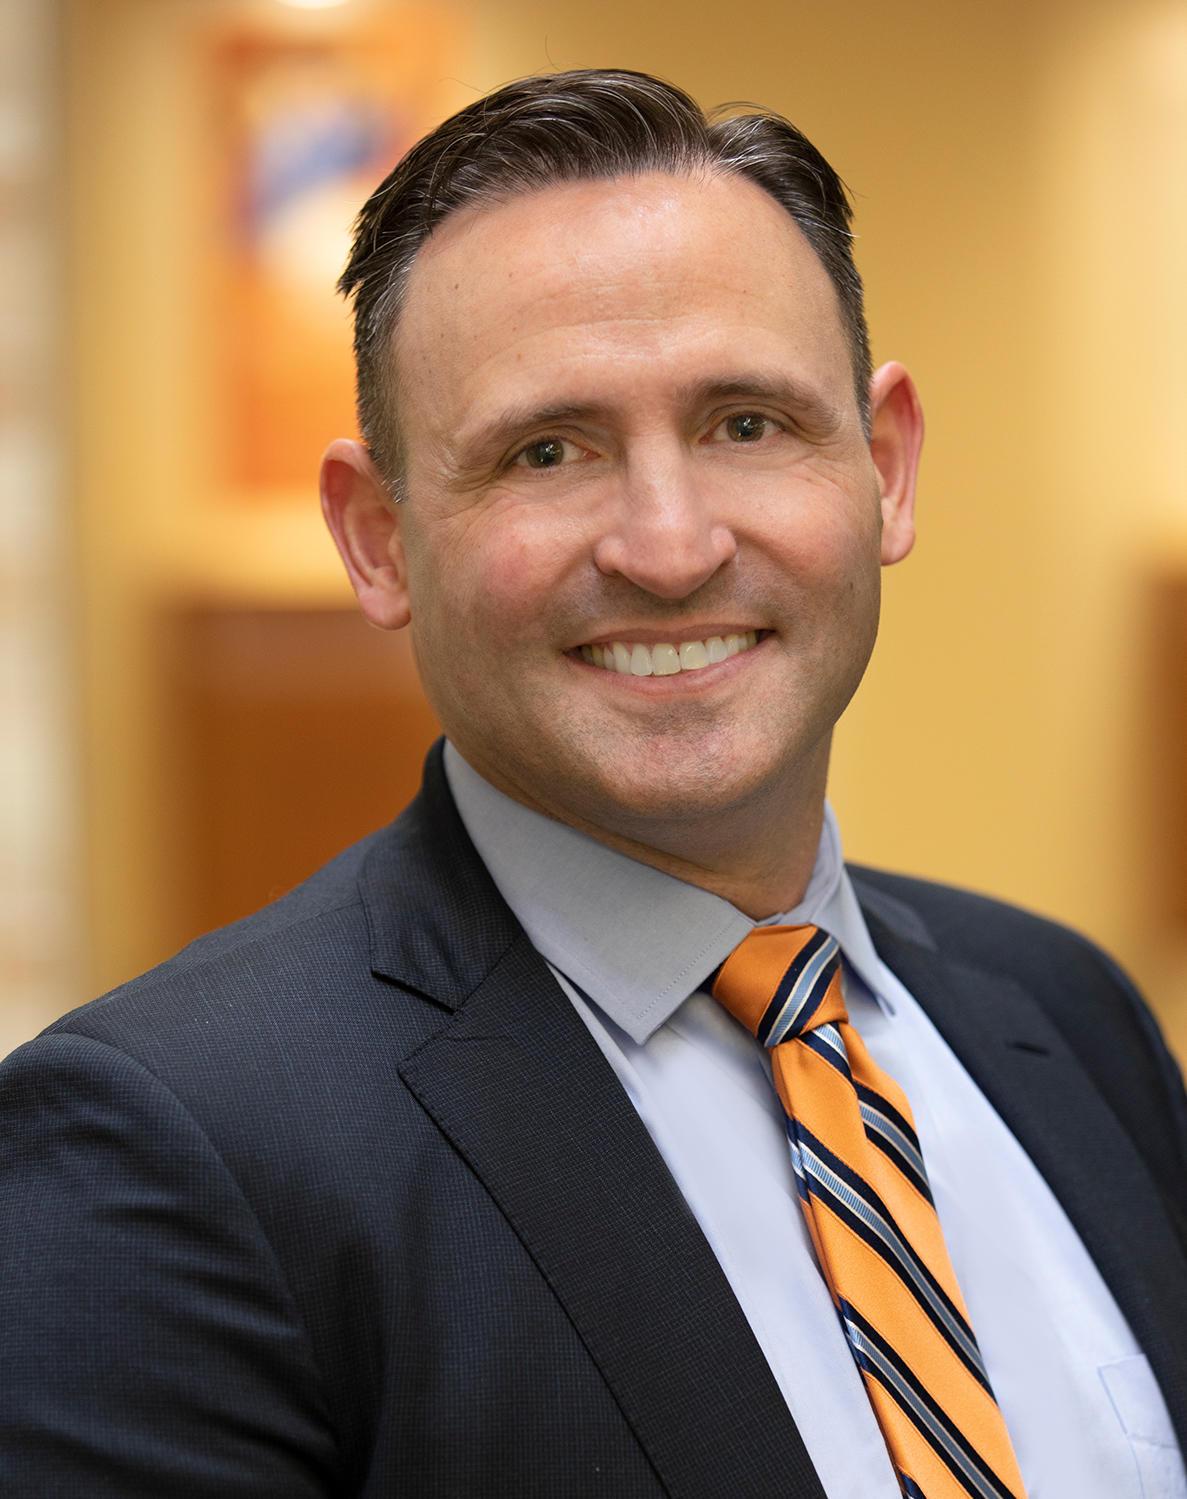 Jared Vogler - Beacon Medical Group Orthopaedics & Sports Specialists Navarre image 0